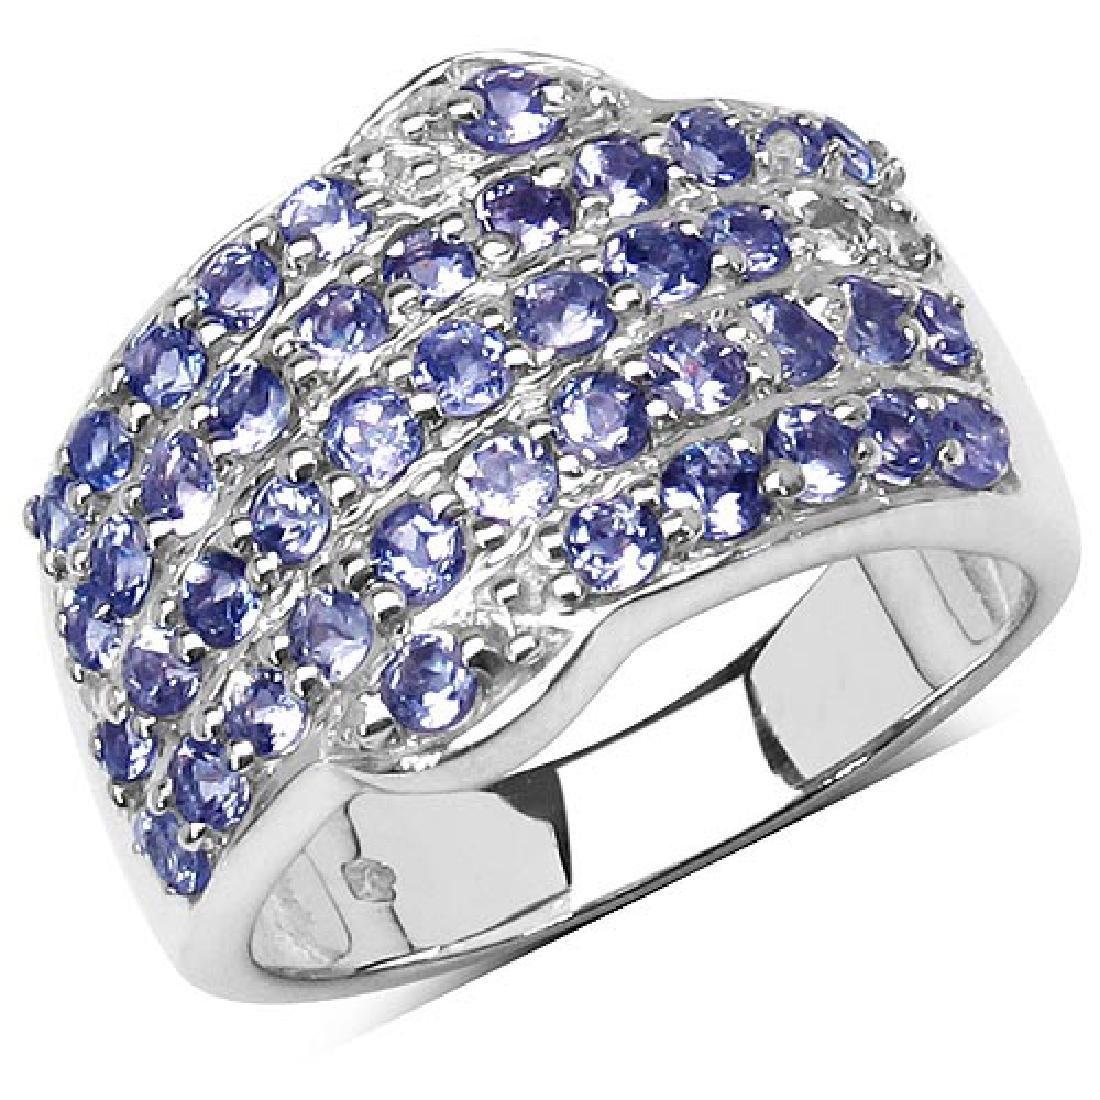 1.58 Carat Genuine Tanzanite .925 Streling Silver Ring